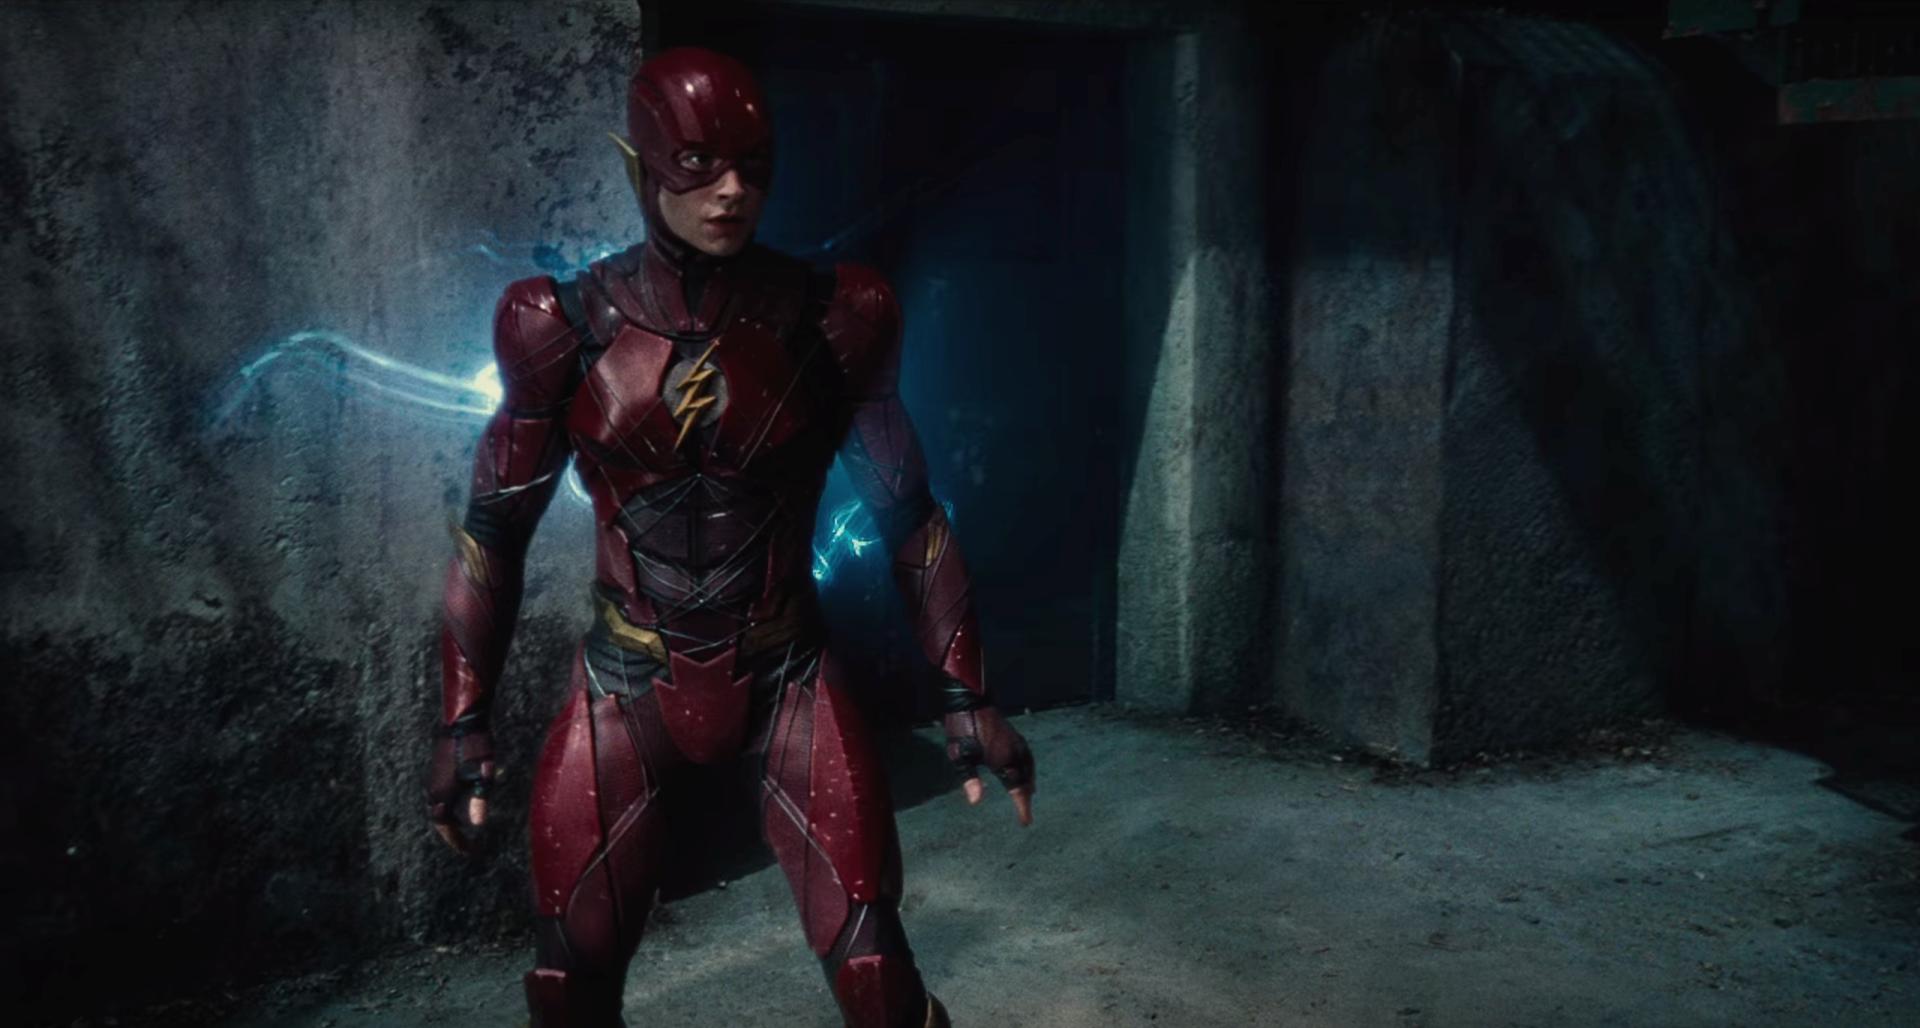 Movie - Justice League (2017)  Ezra Miller Justice League Flash DC Universe Wallpaper